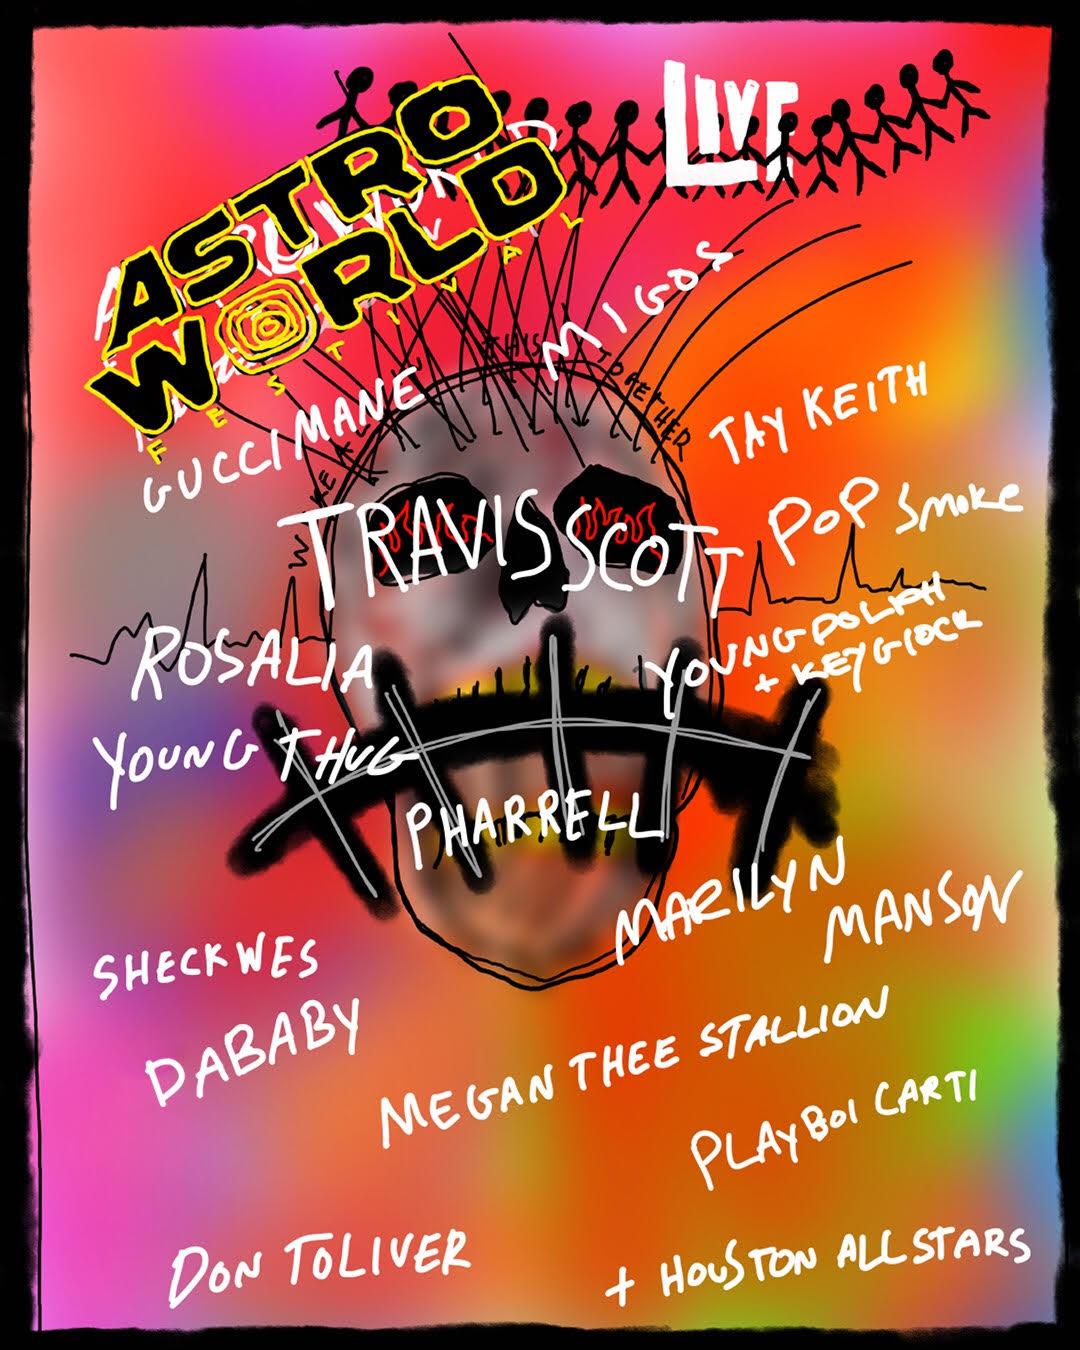 Astroworld Festival 2019 lineup